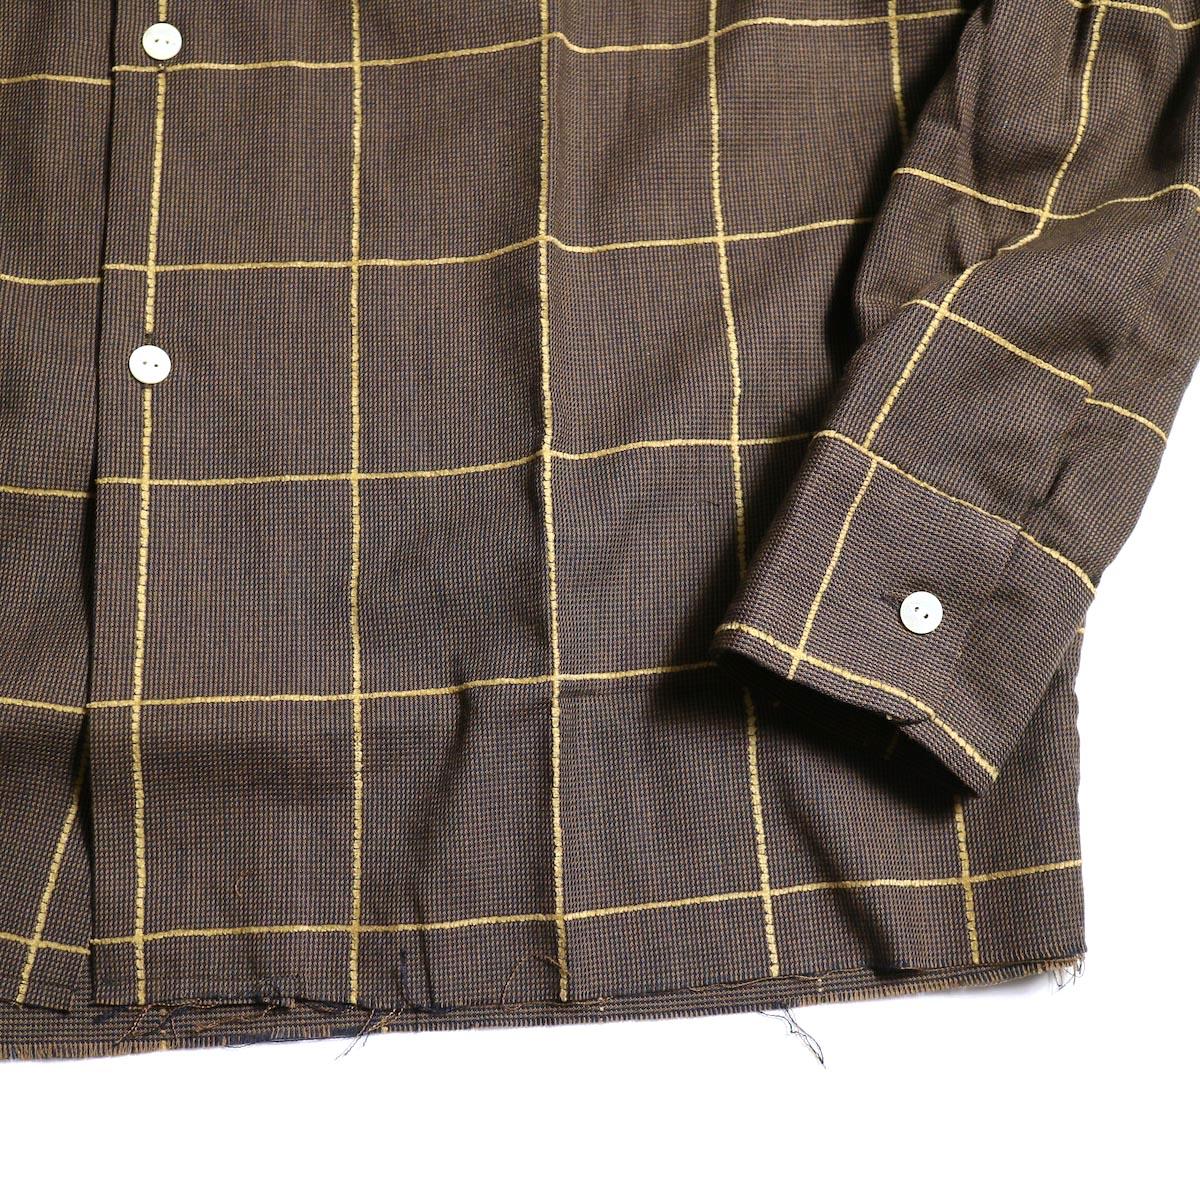 Needles / C.O.B. CLASSIC SHIRT -C/PE/R PLAID TWILL裾、袖